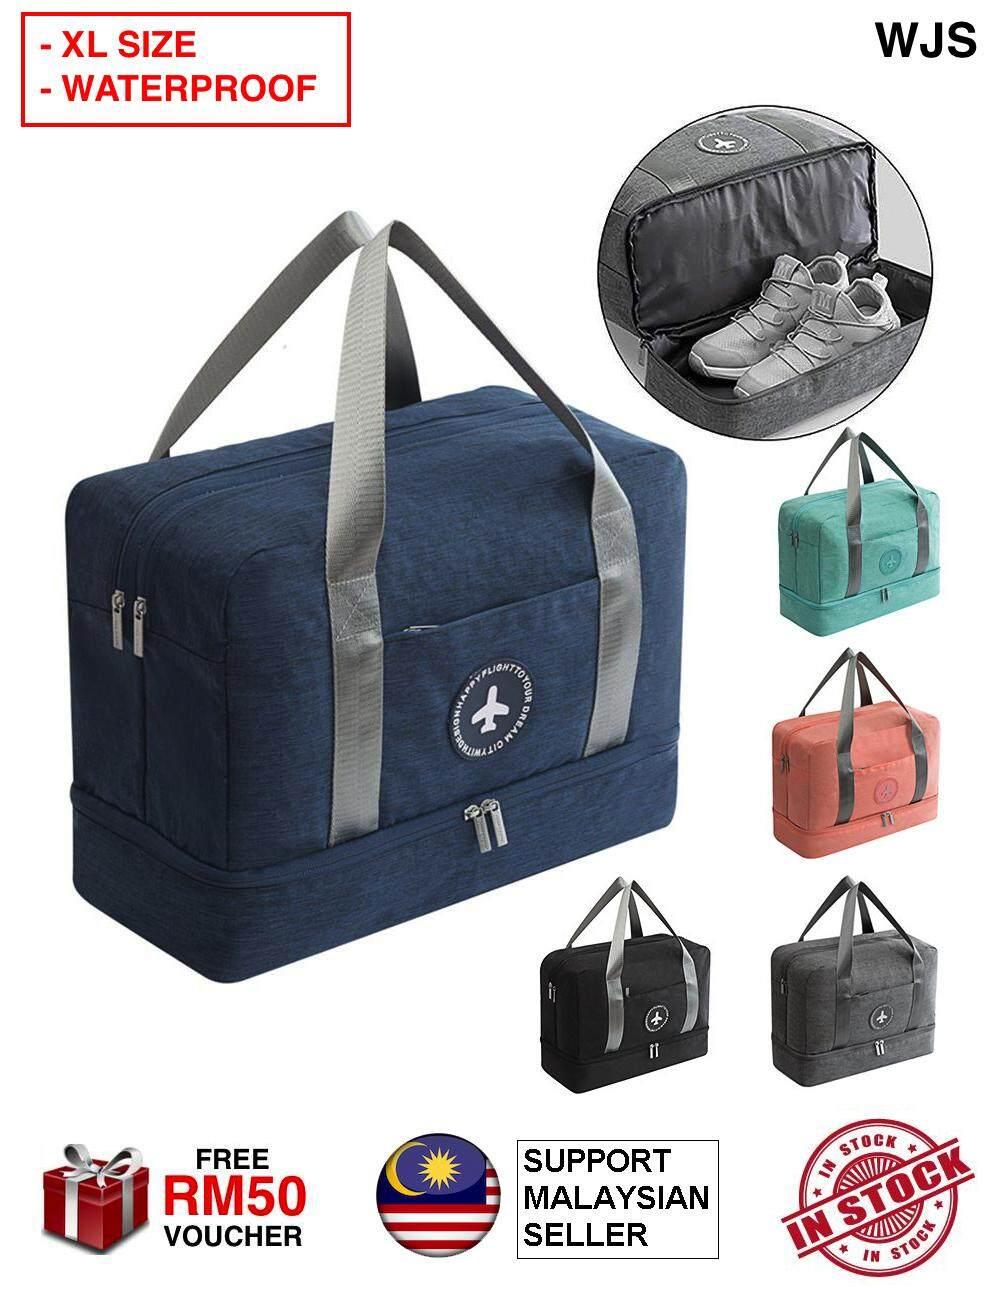 (LARGE SIZE) WJS Waterproof Travel Weekender Bag with Large Shoe Compartment Waterproof Gym Bag Shoe Swim Bag Gym Bag Travel Bag Traveling Bag Holiday Bag Holiday Luggage Weekender Bags Dry Wet Depart Mesh Tote Bag MULTICOLOR [FREE RM 50 VOUCHER]